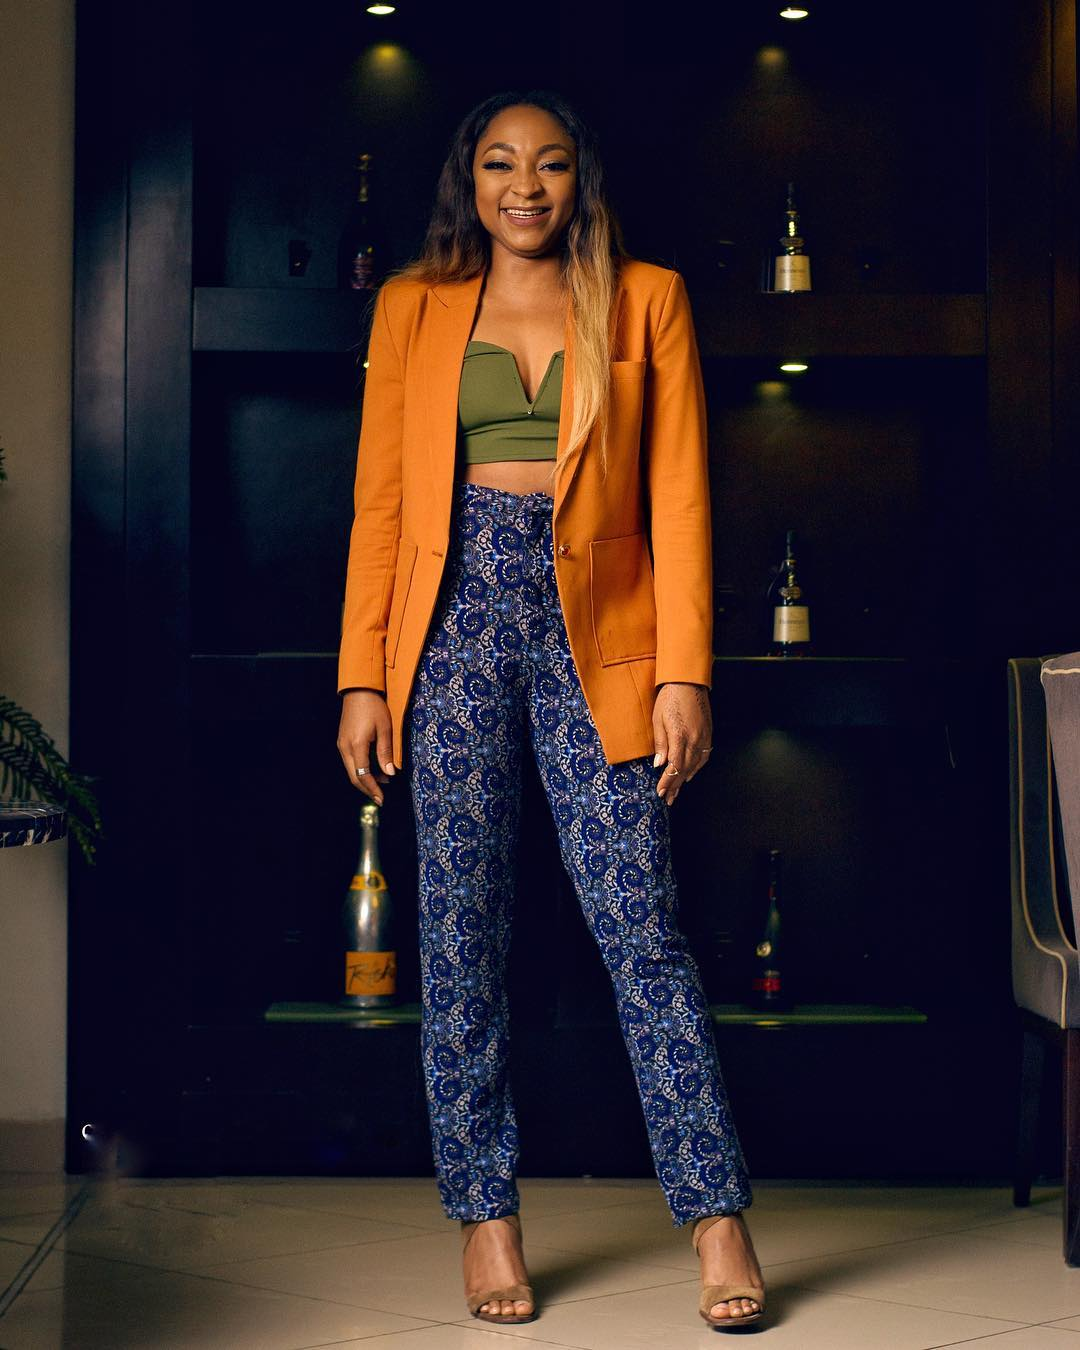 fashionable African girls